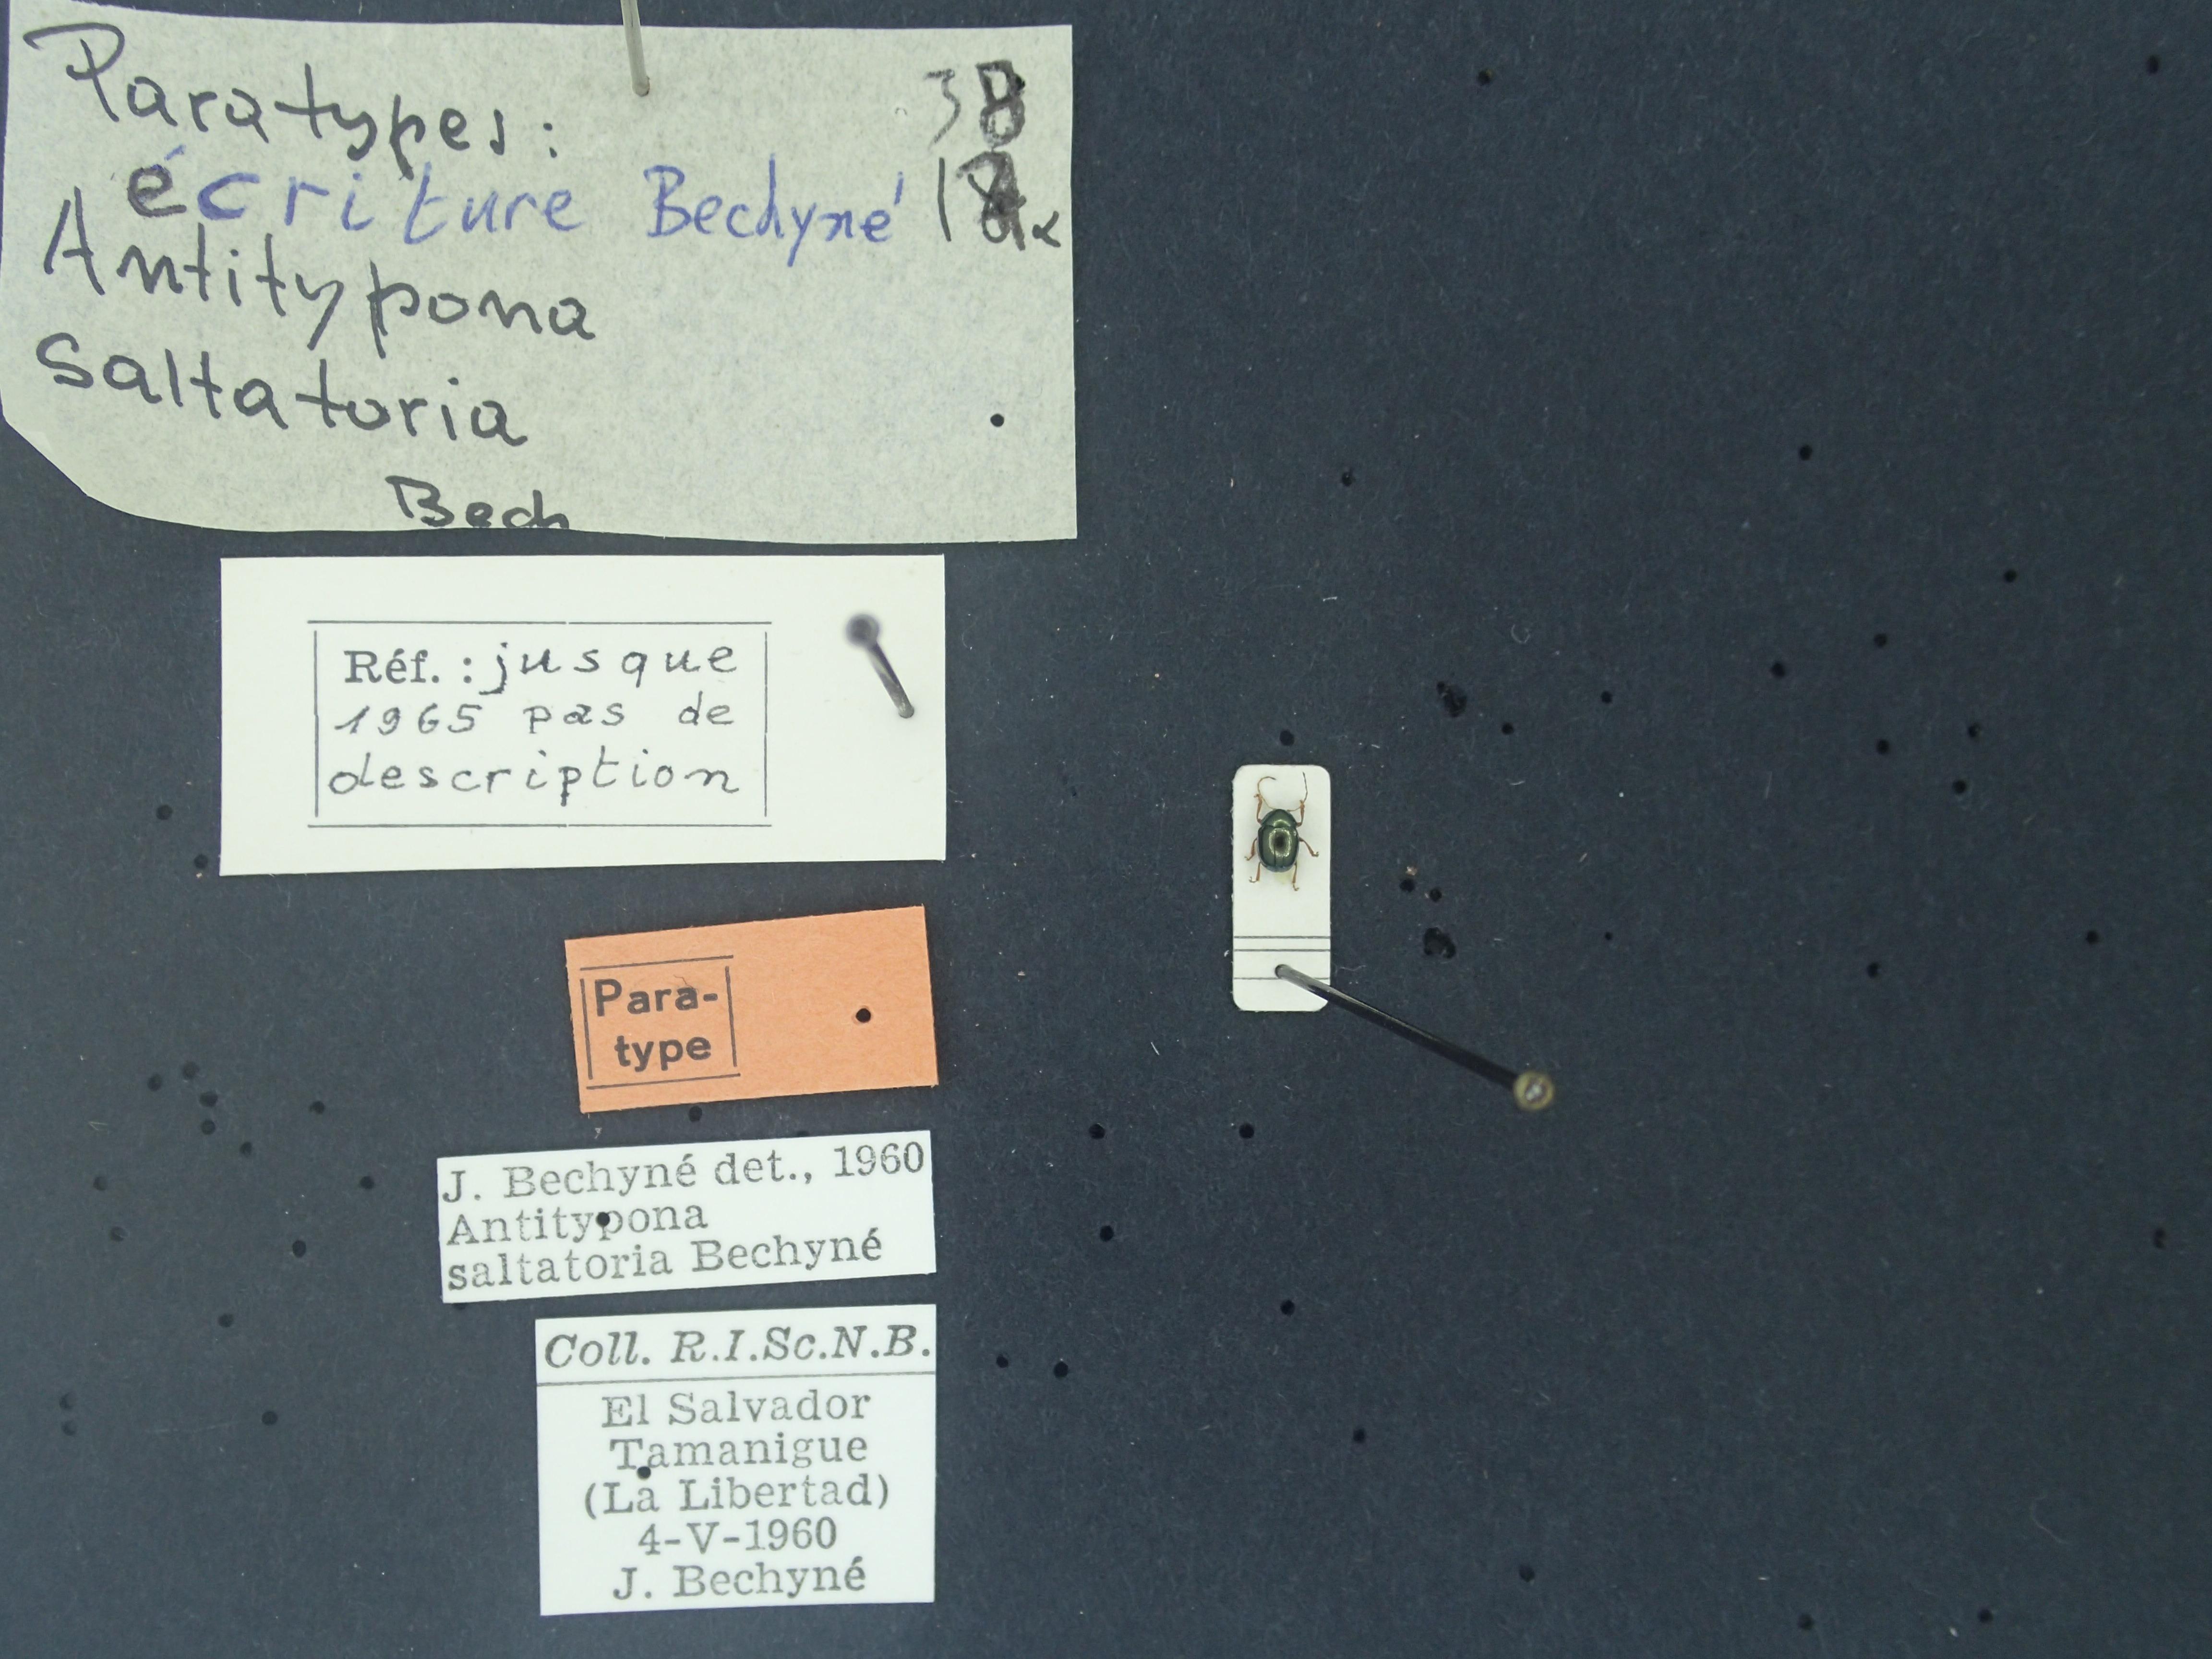 BE-RBINS-ENT Antitypona saltatoria K30_D01_009 Label.jpg